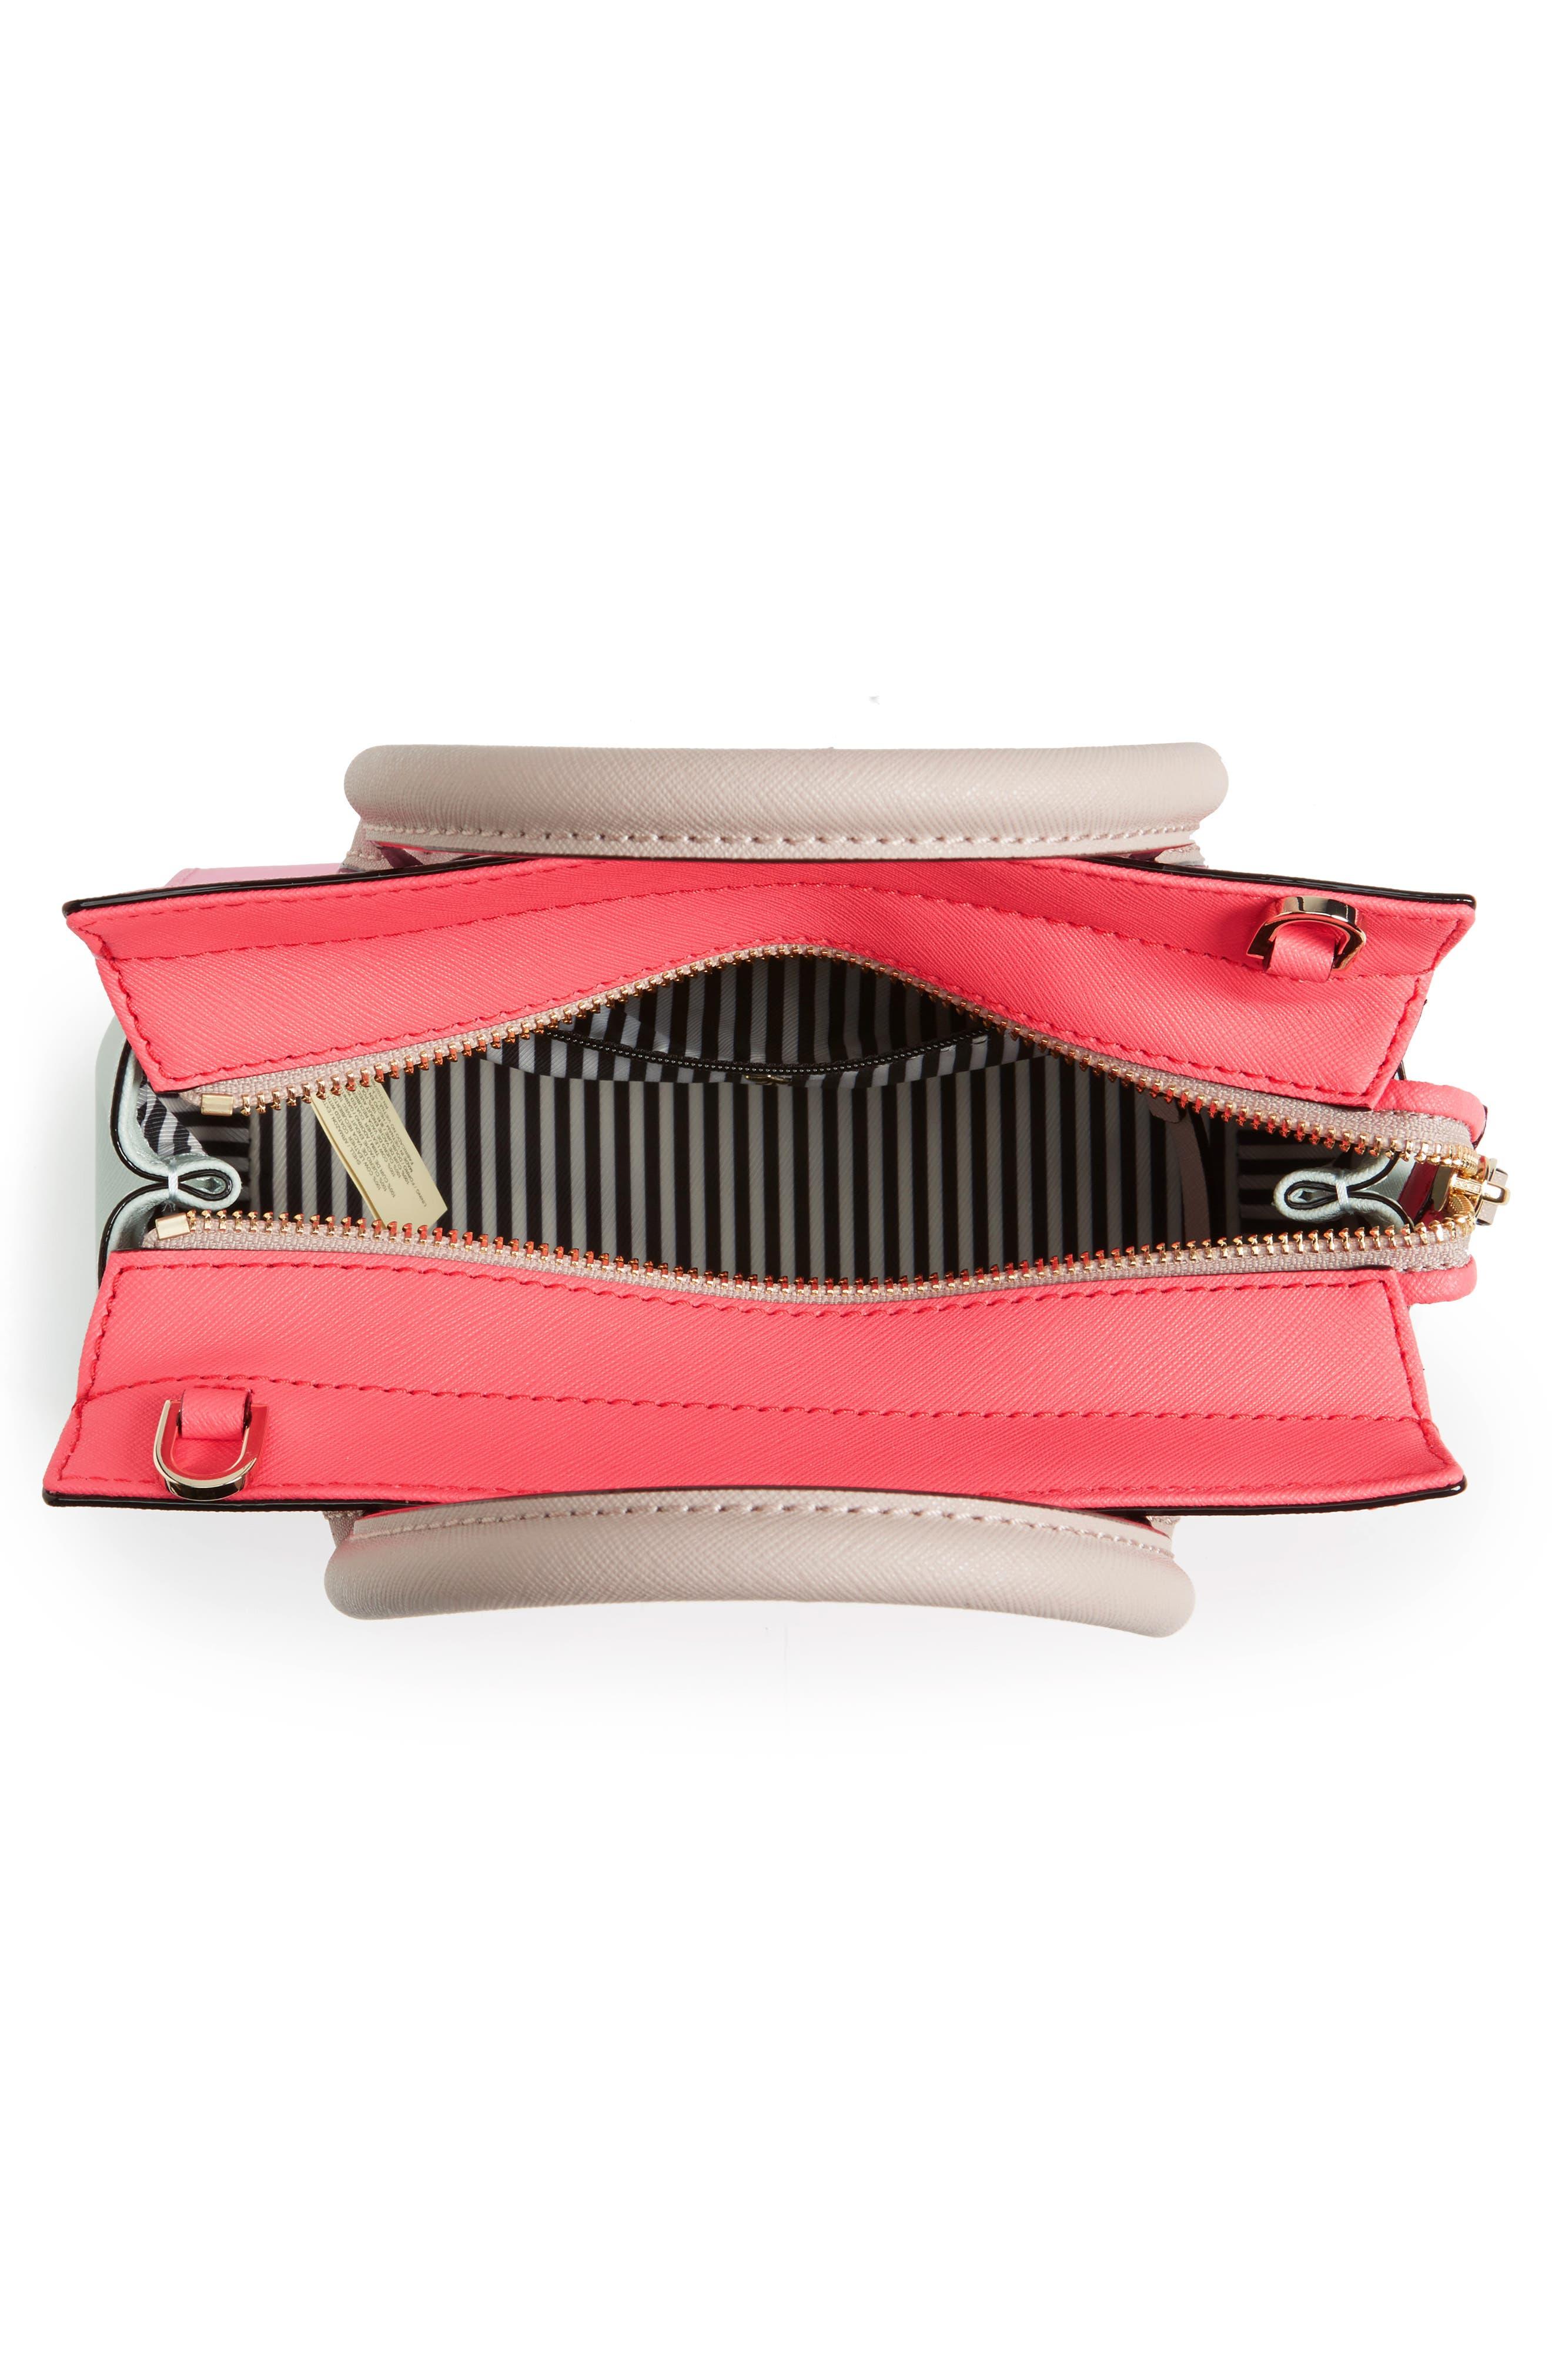 'cameron street - mini candace' leather satchel,                             Alternate thumbnail 4, color,                             690